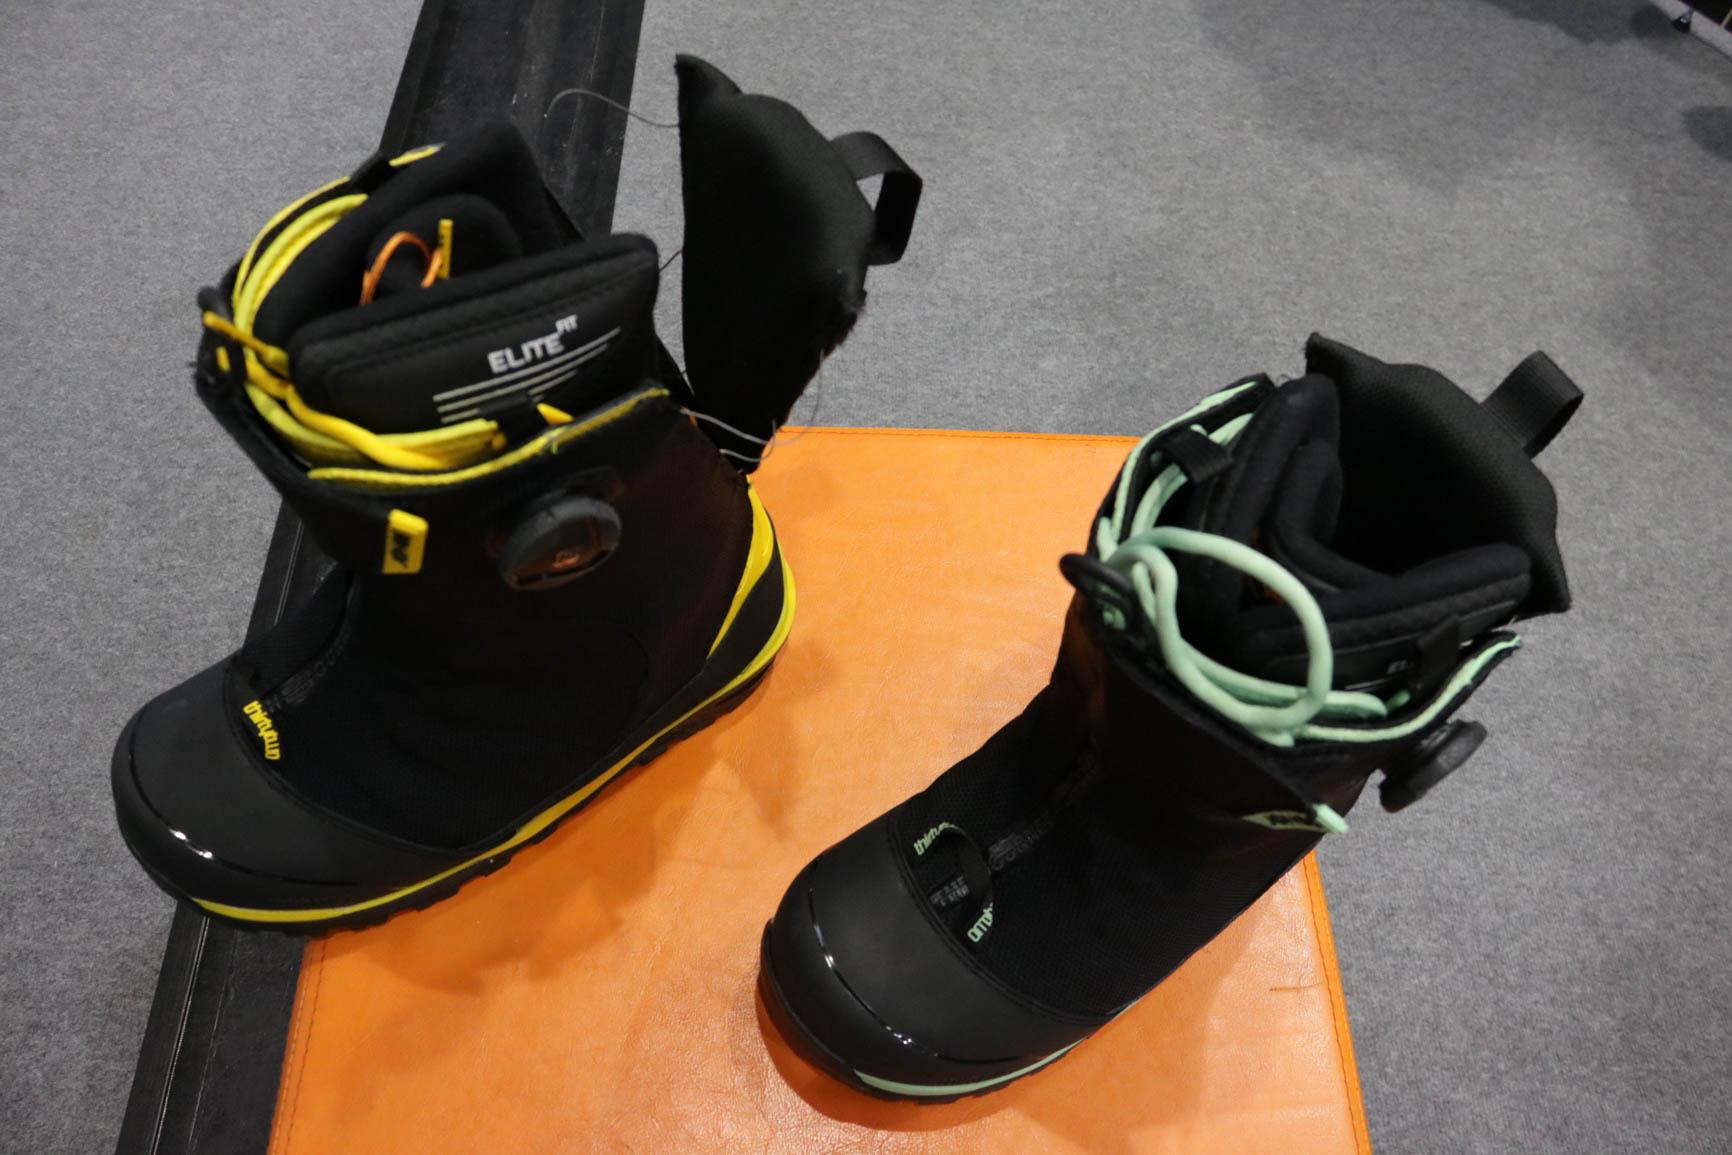 ThirtyTwo Jones MTB 18/19 (recht) und Women's Jones MTB 18/19 (links) - ultimative Backcountry Boots